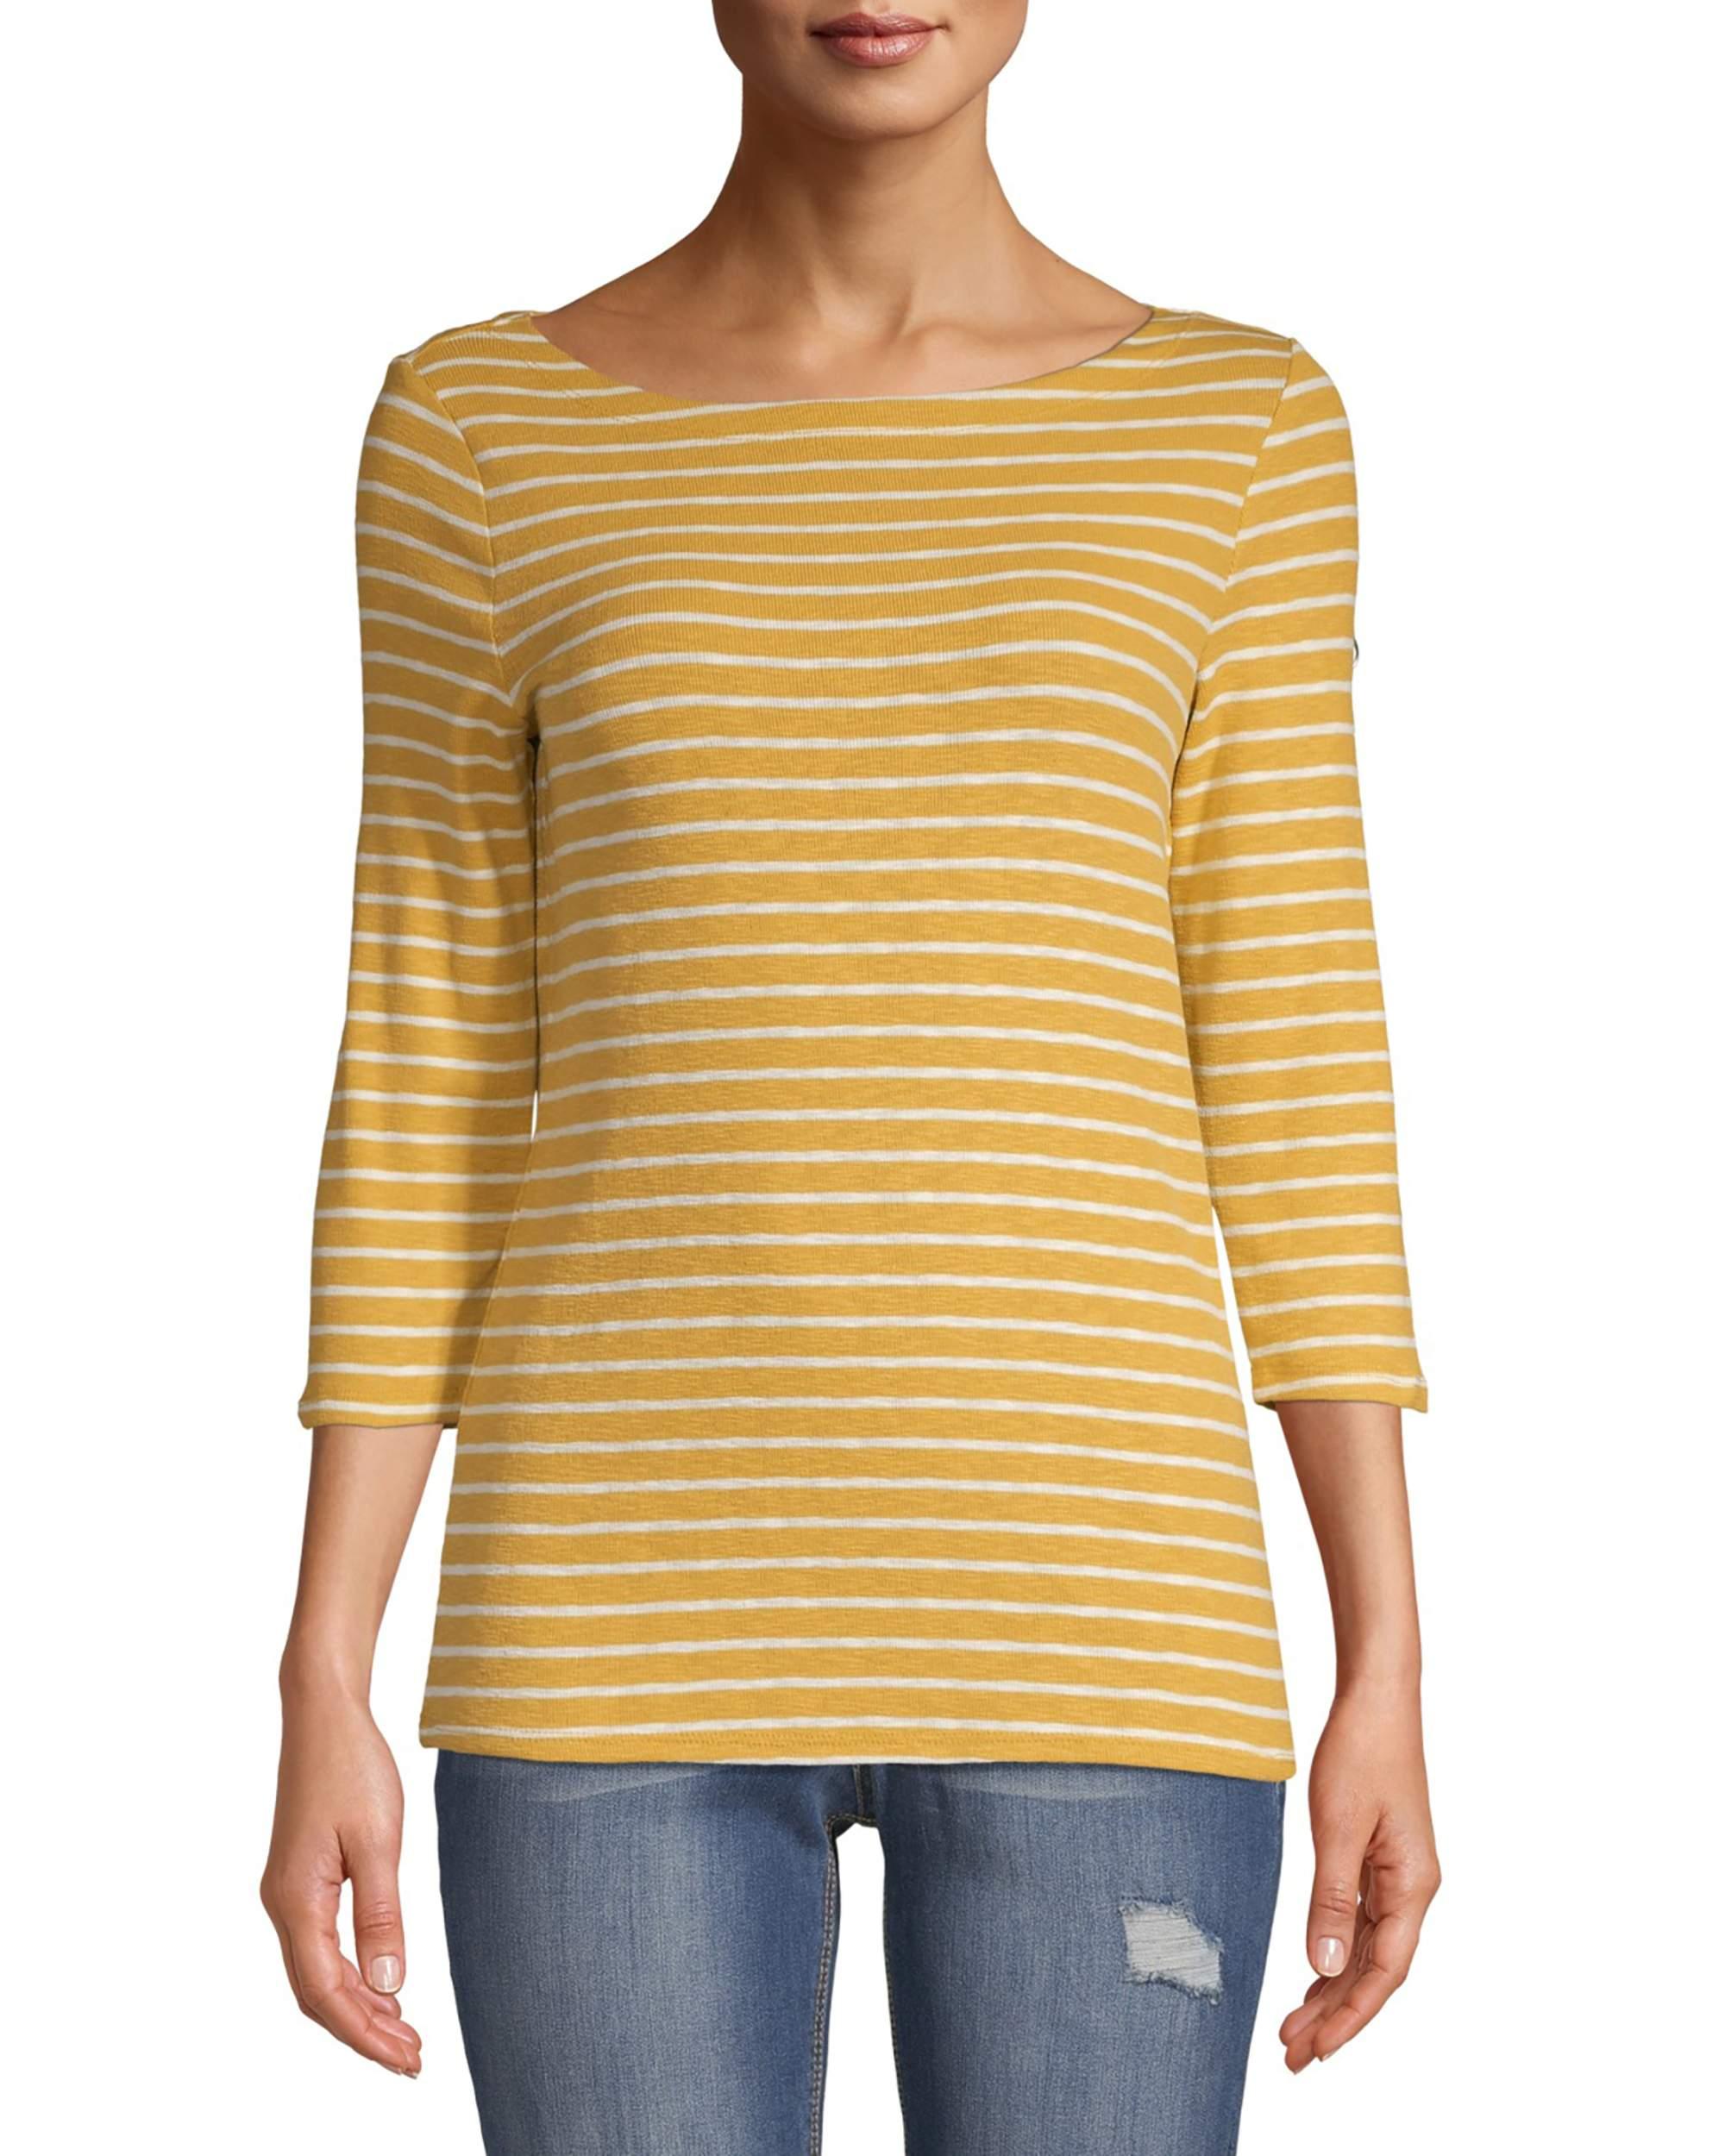 striped boatneck shirt - walmart fashion - walmart style - cute walmart clothes - affordable fall clothing - striped boatneck tshirt